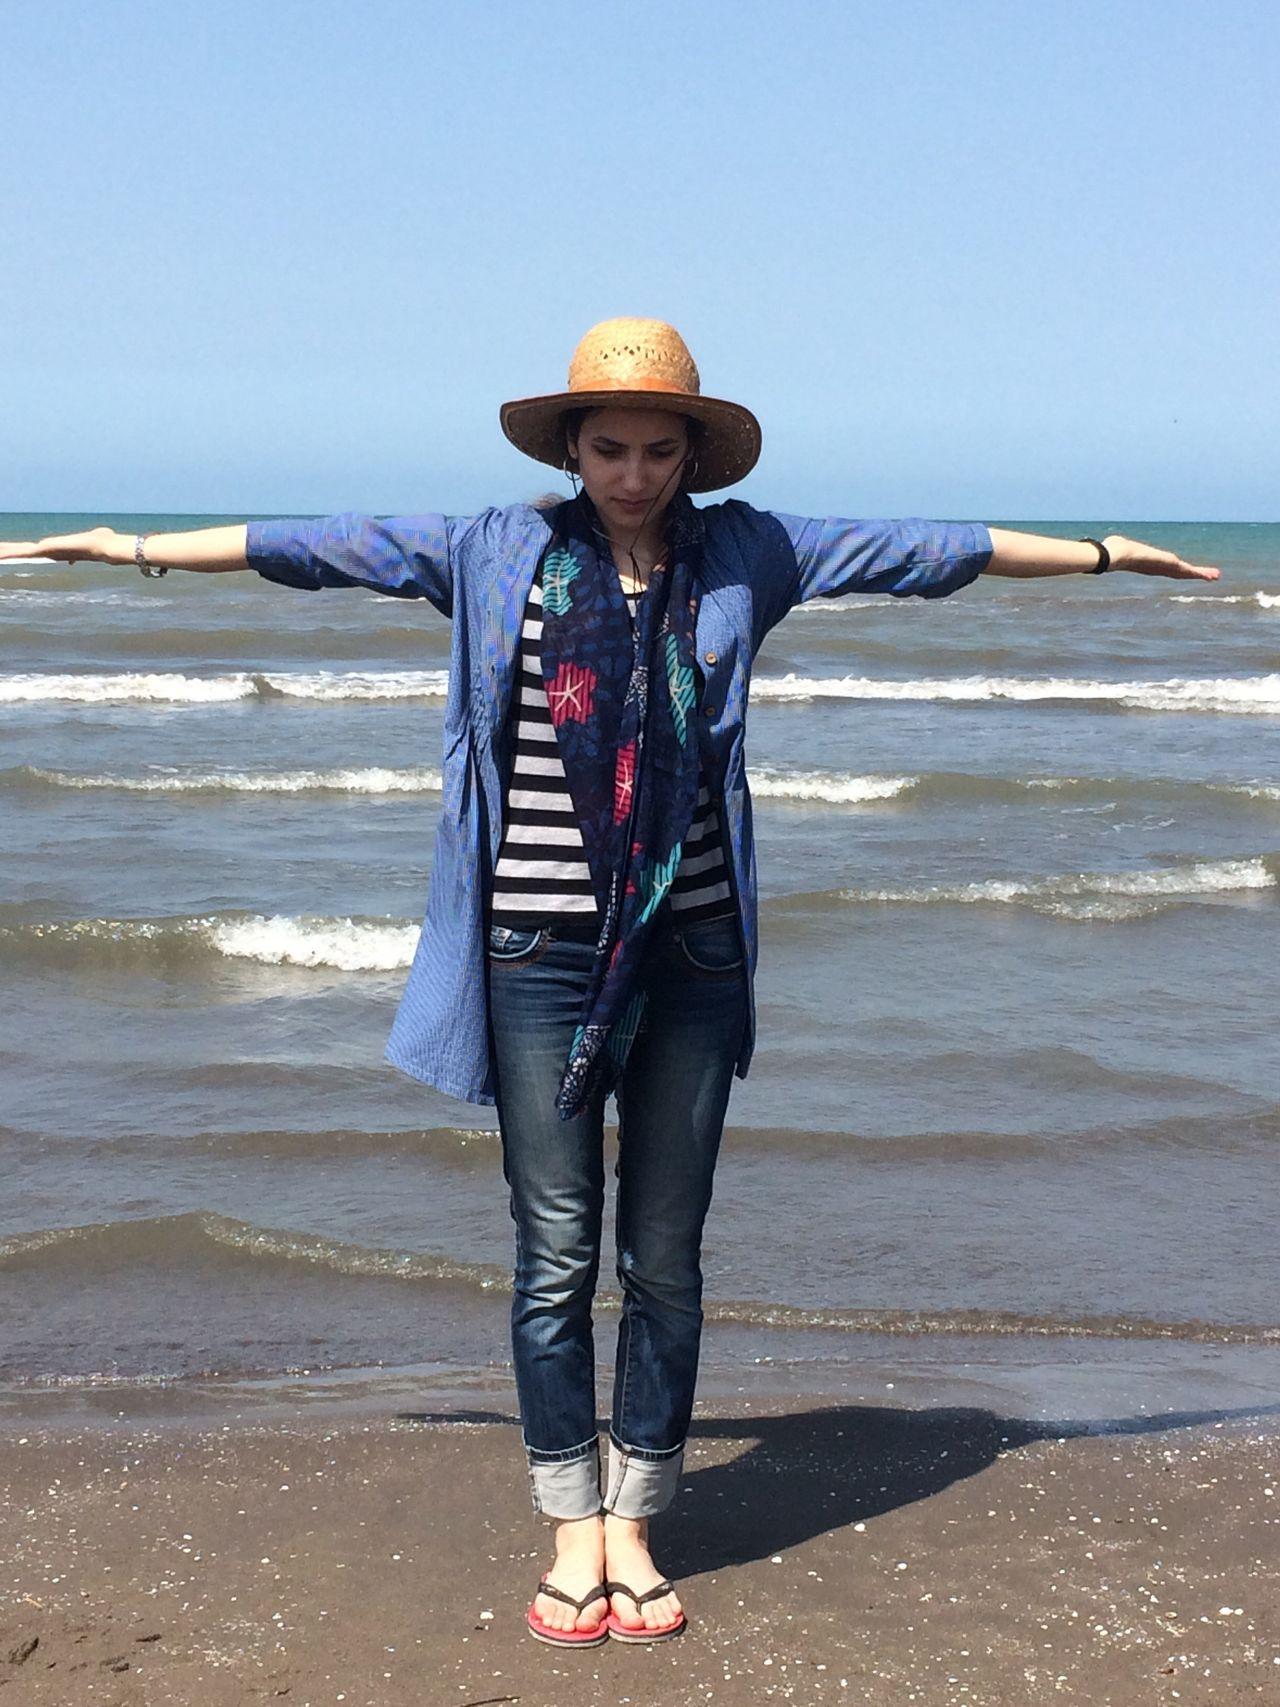 43 Golden Moments The Sea And Me Woman And The Sea All In Sea Blue Sky Blue Sea Caspian Sea Iran Gilanphotography Gilan Fine Art